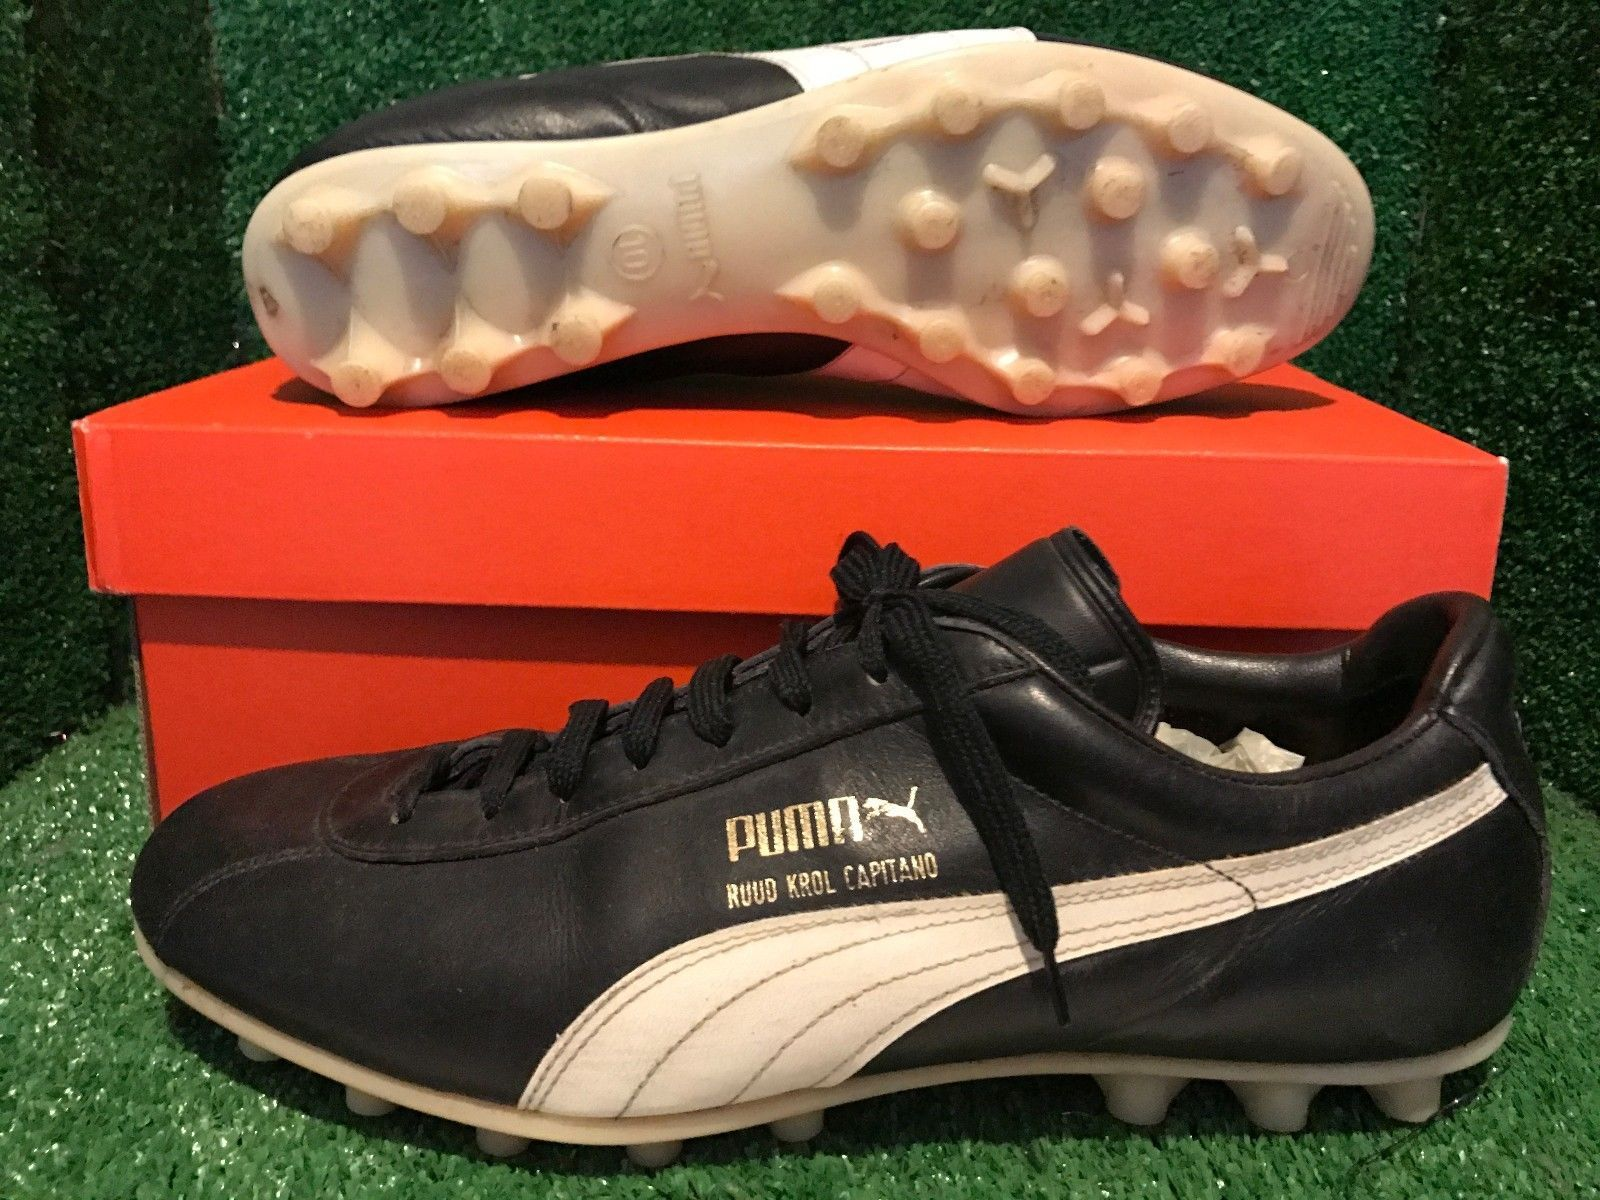 e3639fa6f1 vintage puma shoes boots PUMA Ruud Krol soccer boots maradona WC Adidas 10  9 44